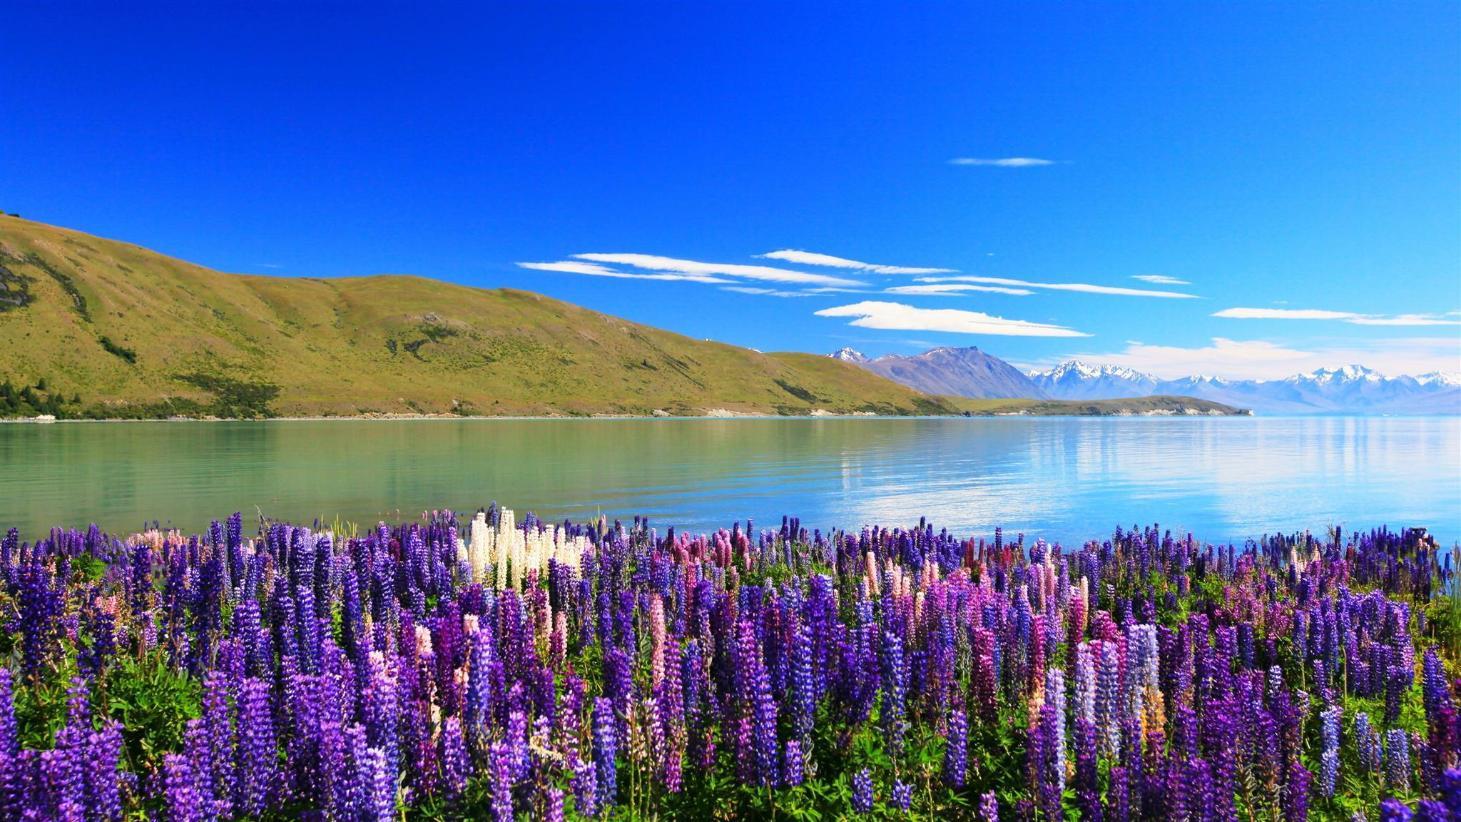 Lake Tekapo Hostels - Best Price + HD Photos of Hostels in Lake Tekapo